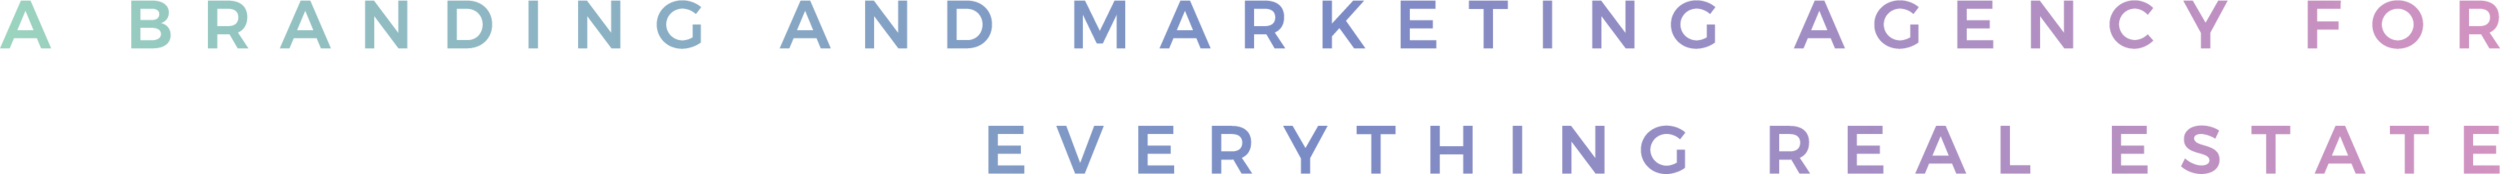 a branding agency.png